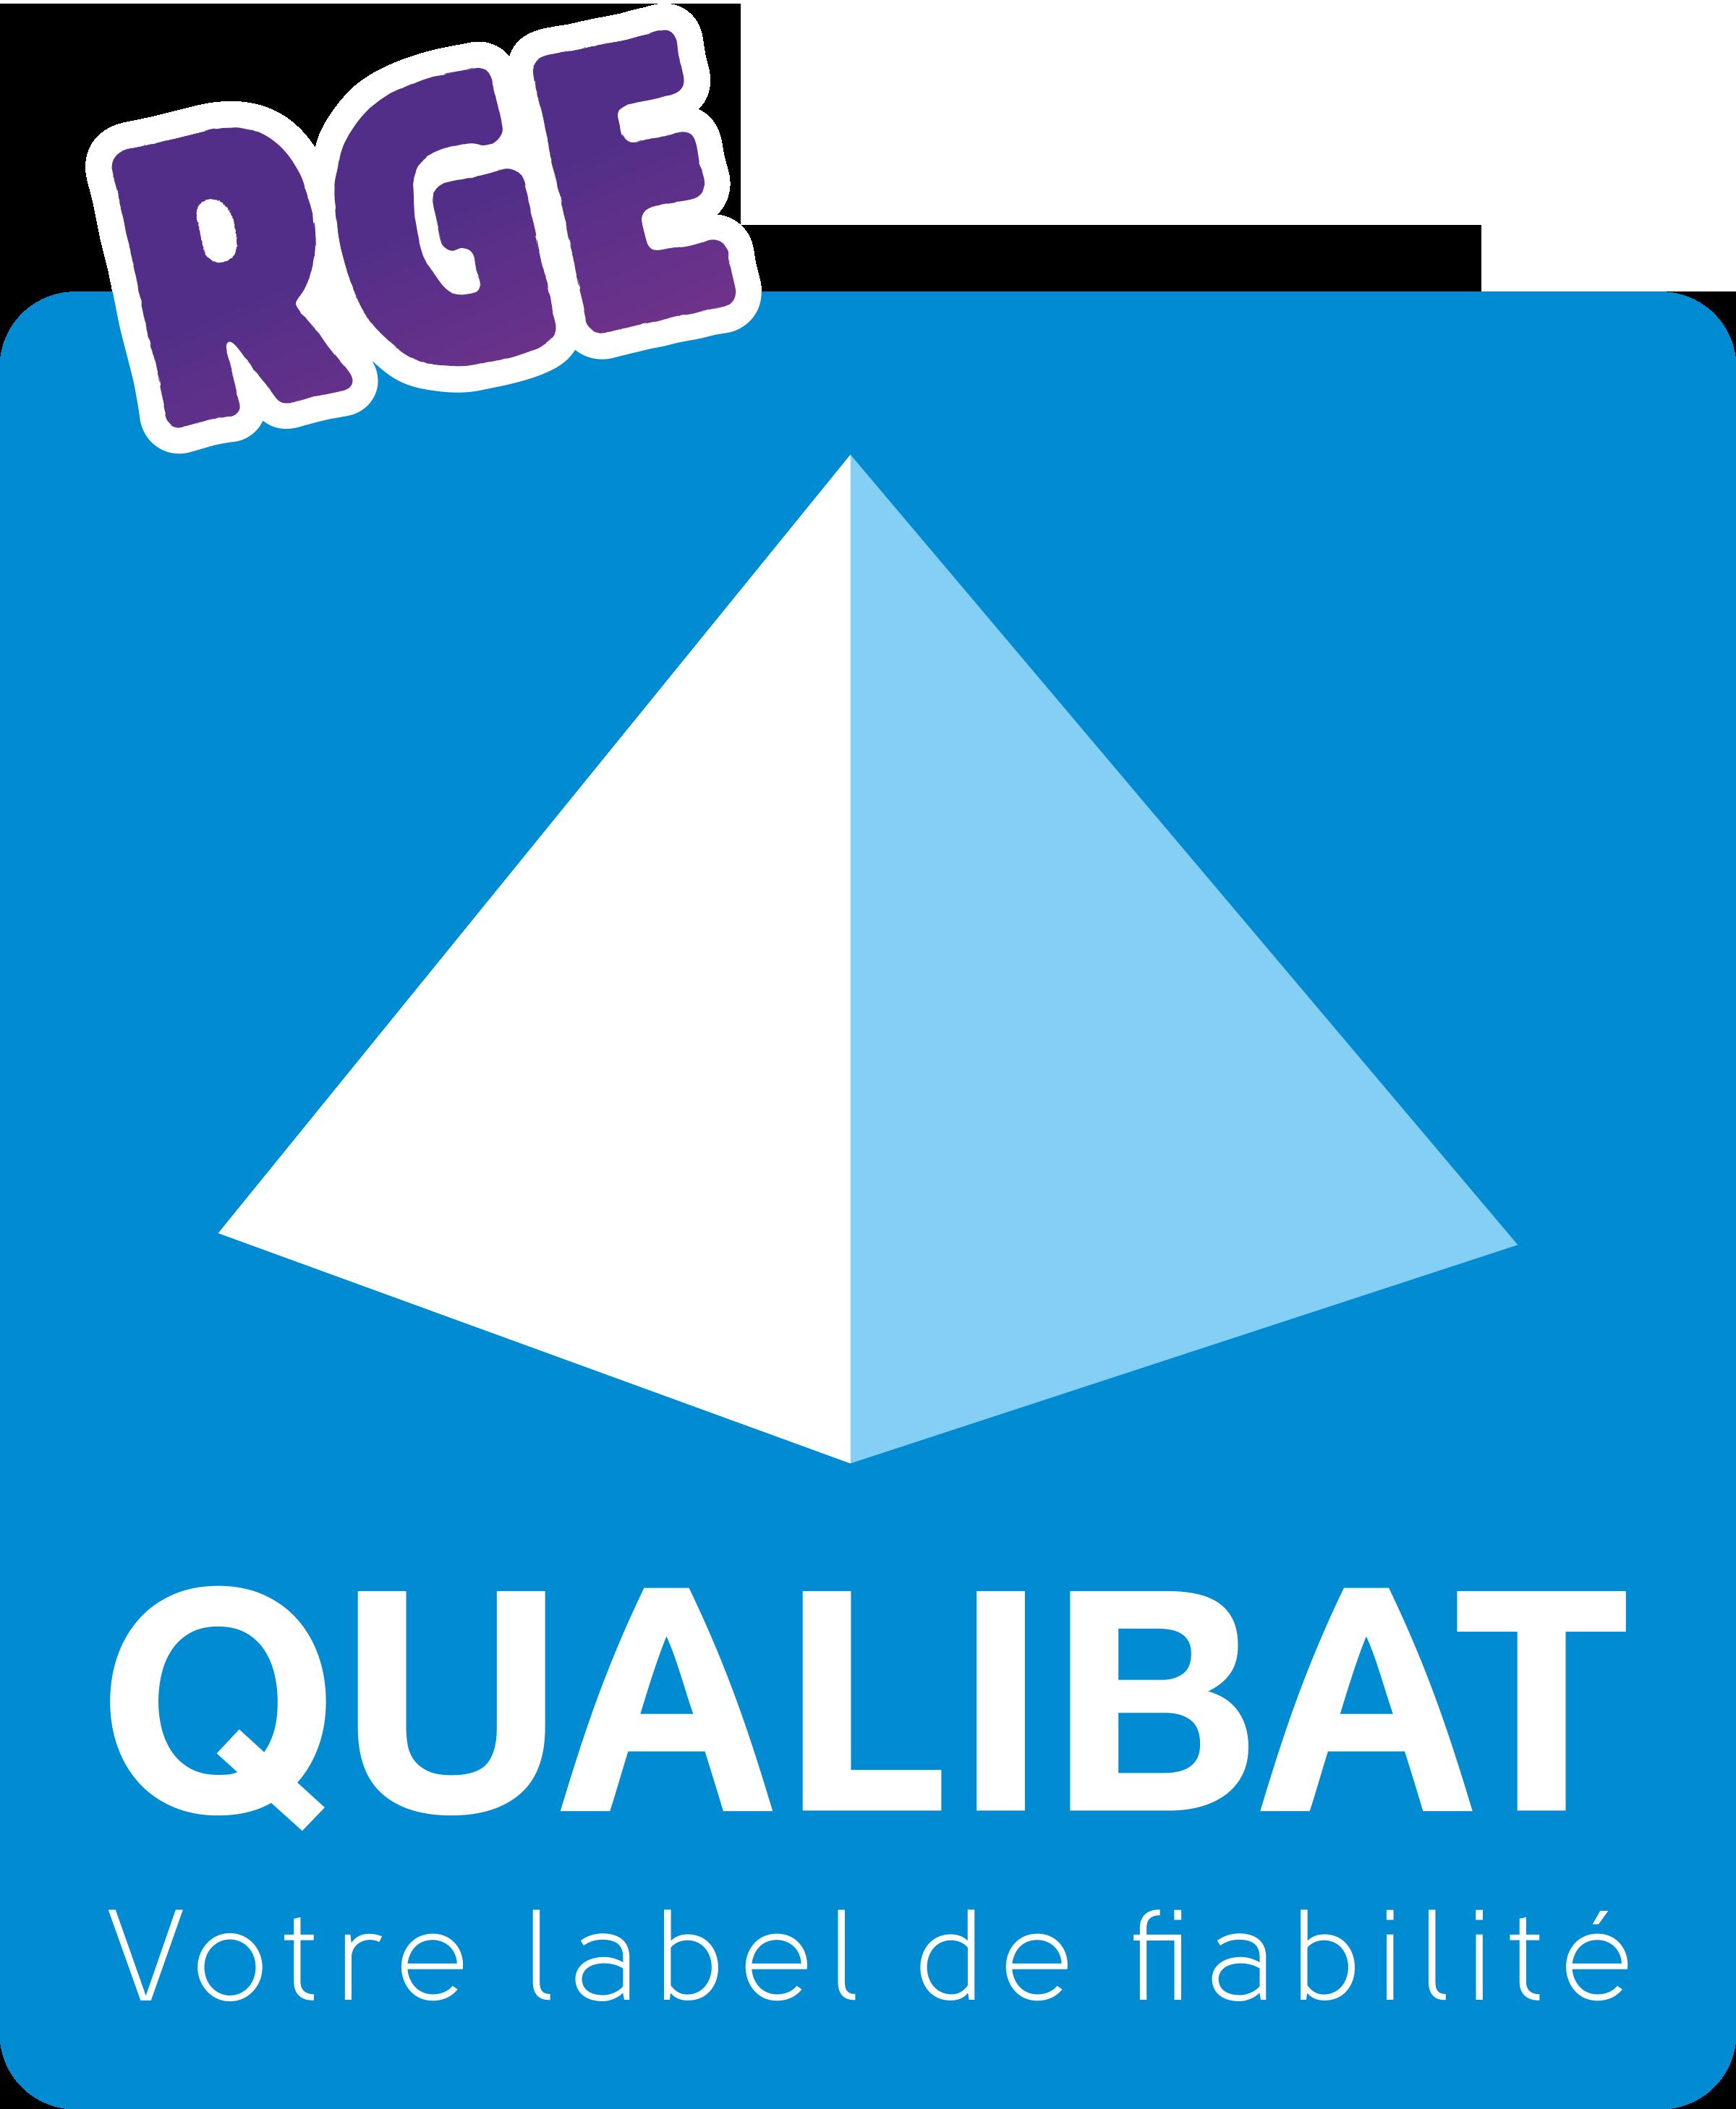 logo qualibat RGE 2015 300dpi RVB - Qui sommes-nous ?